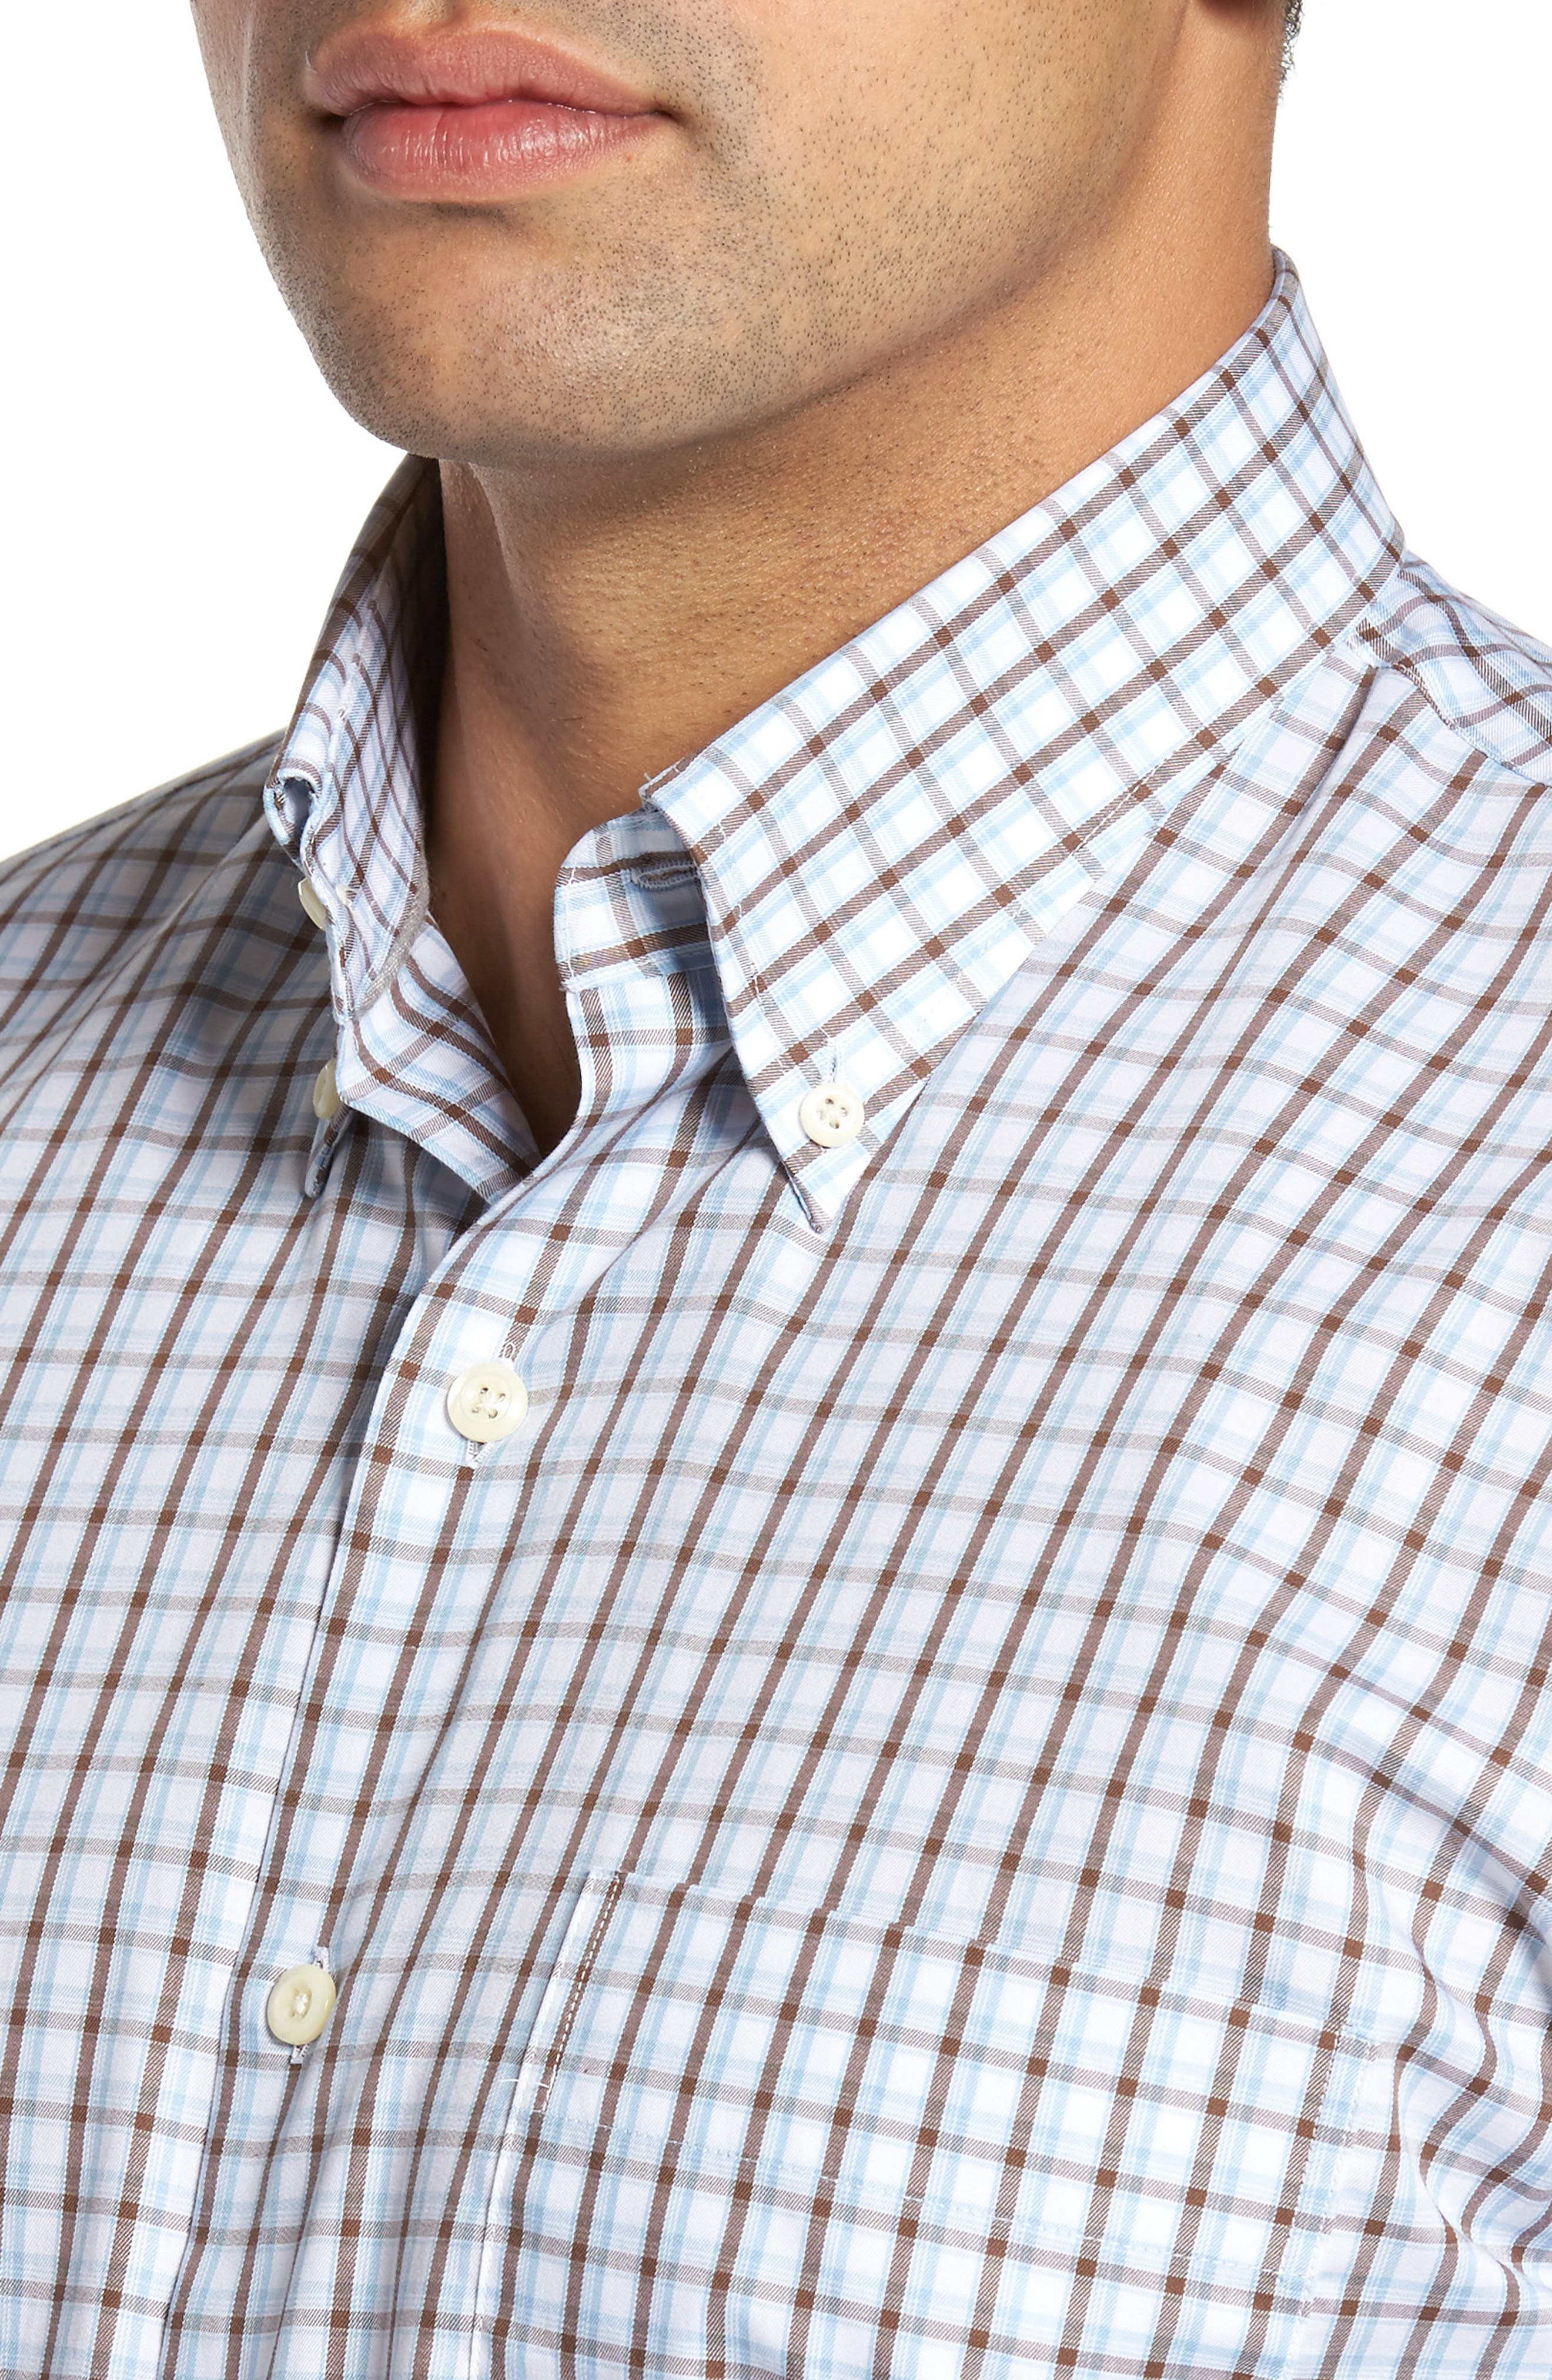 Regular Fit Crisp Pane Sport Shirt,                             Alternate thumbnail 2, color,                             Branch